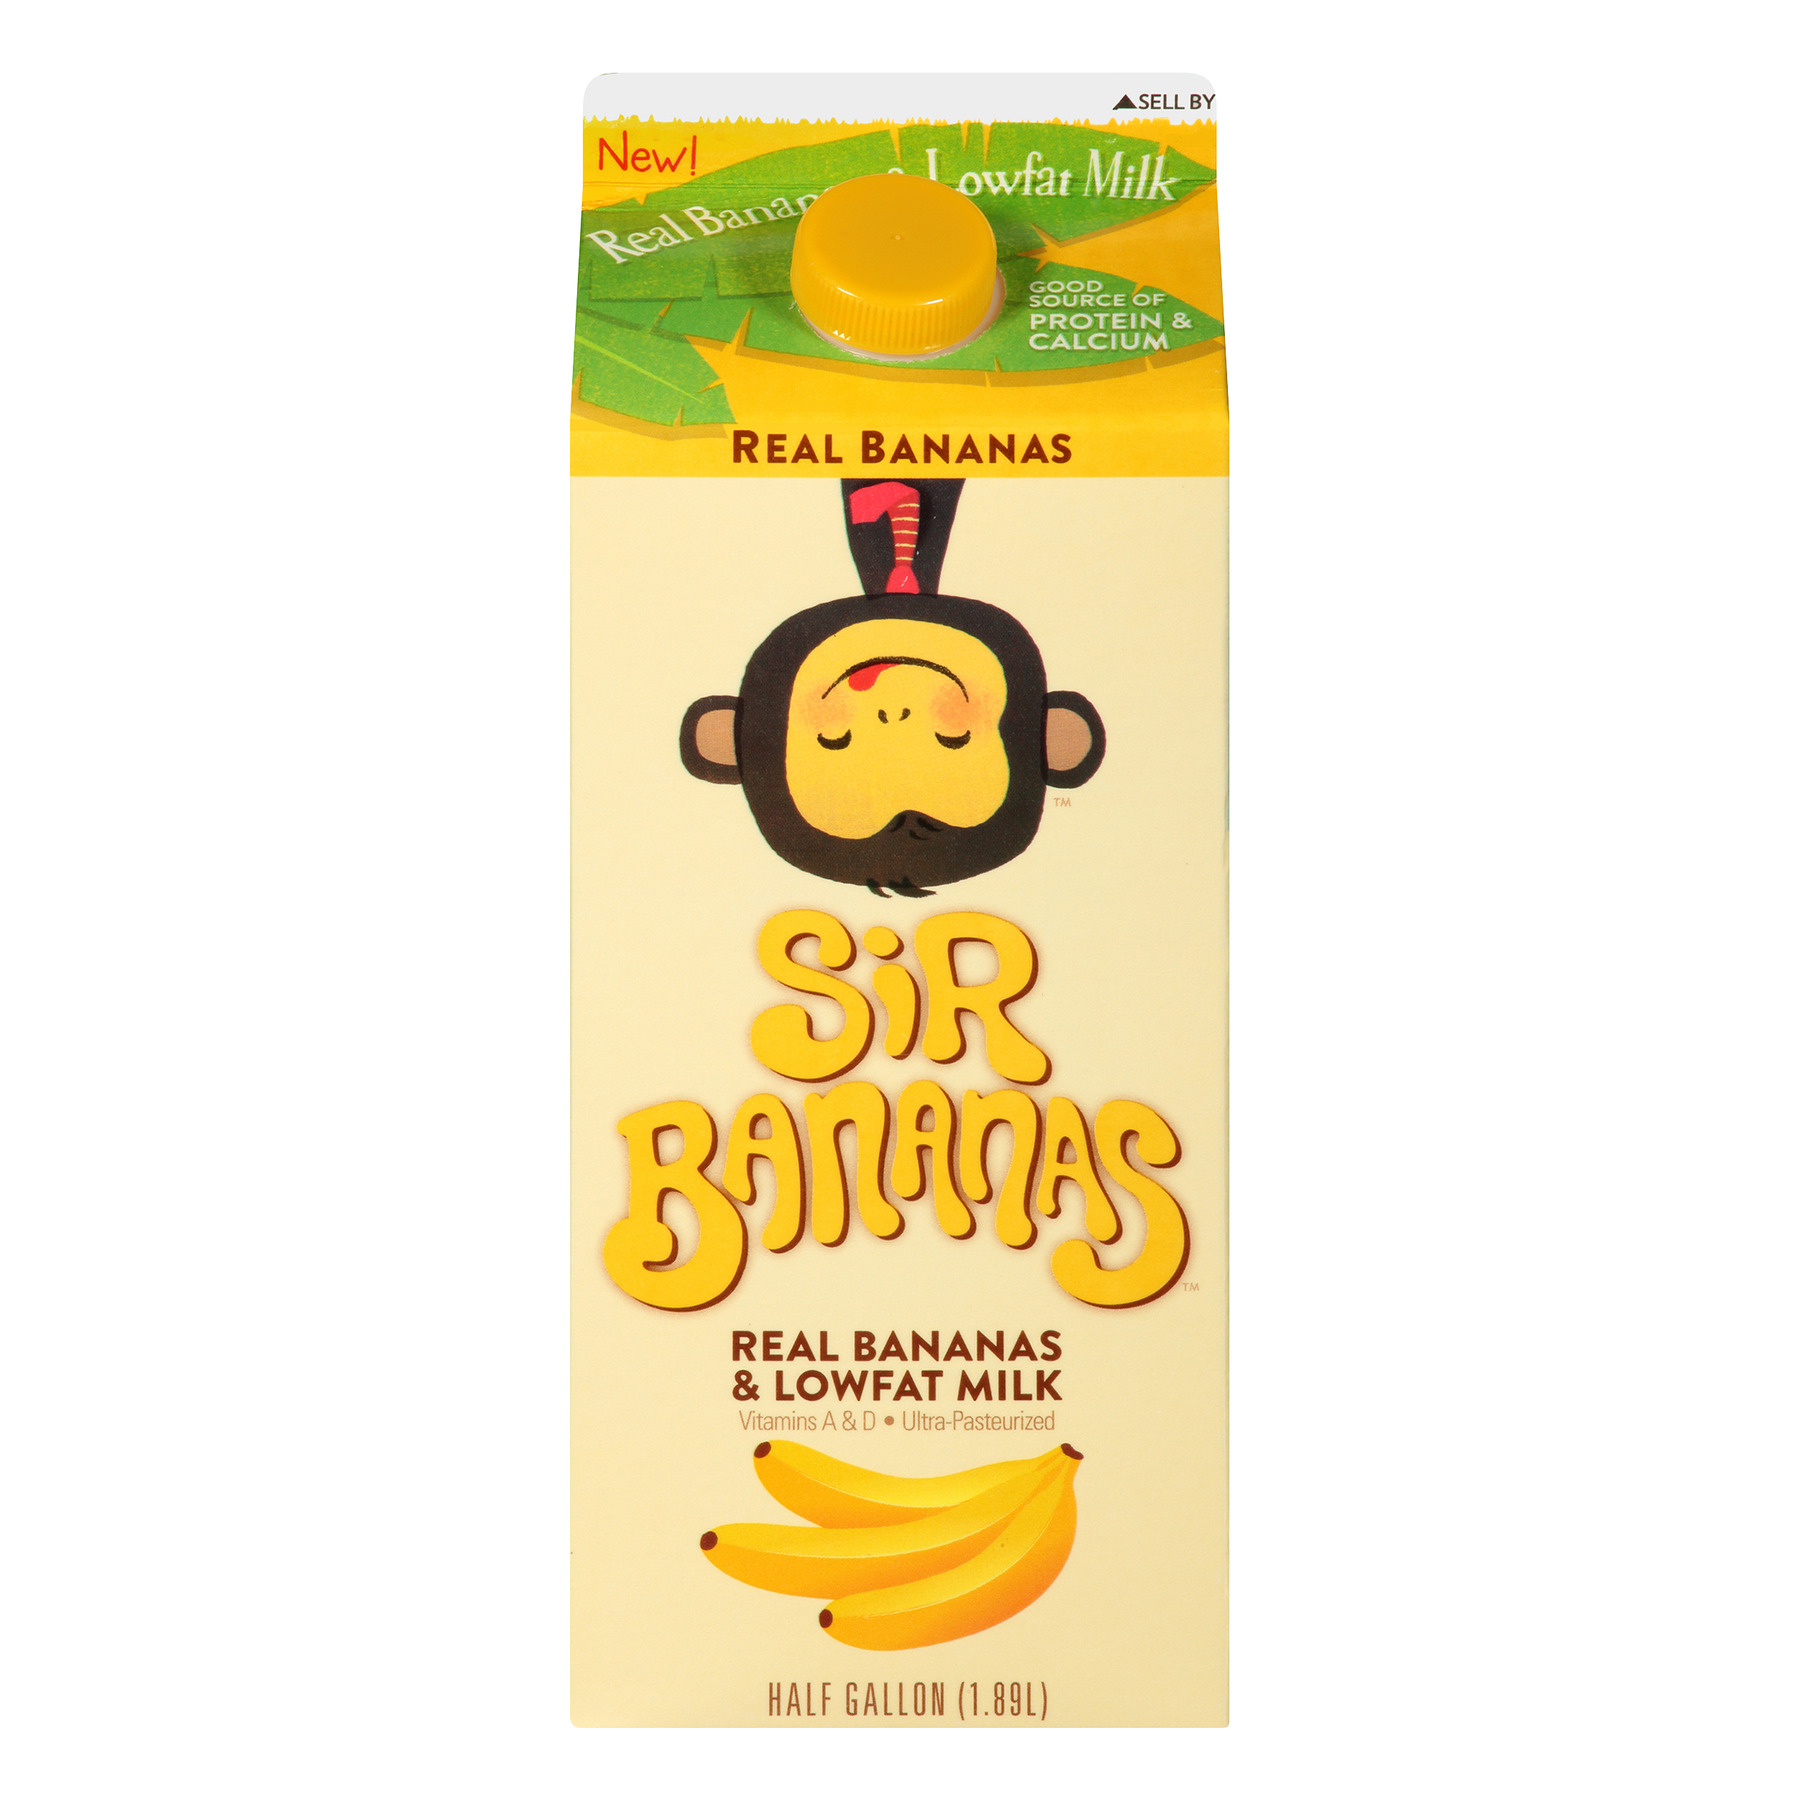 Sir Bananas™ Lowfat Bananamilk 0.5 gal Carton, 1.89 L